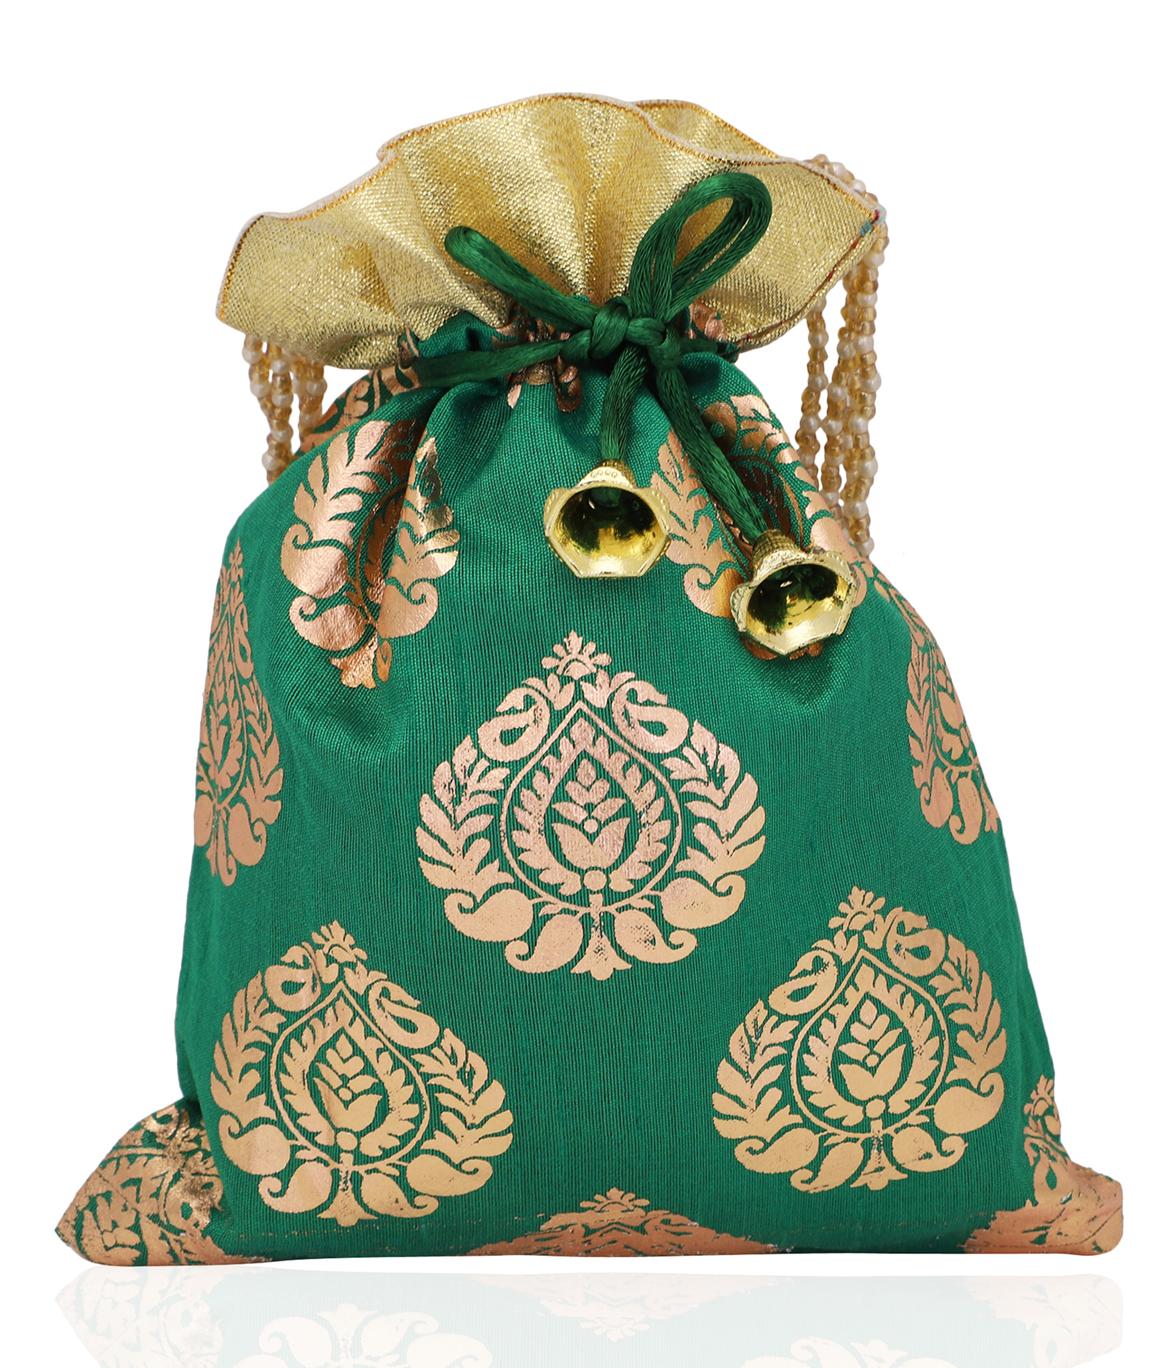 Foil Print Dupion Silk Potli Bag in Green(COLOUR : GREEN)